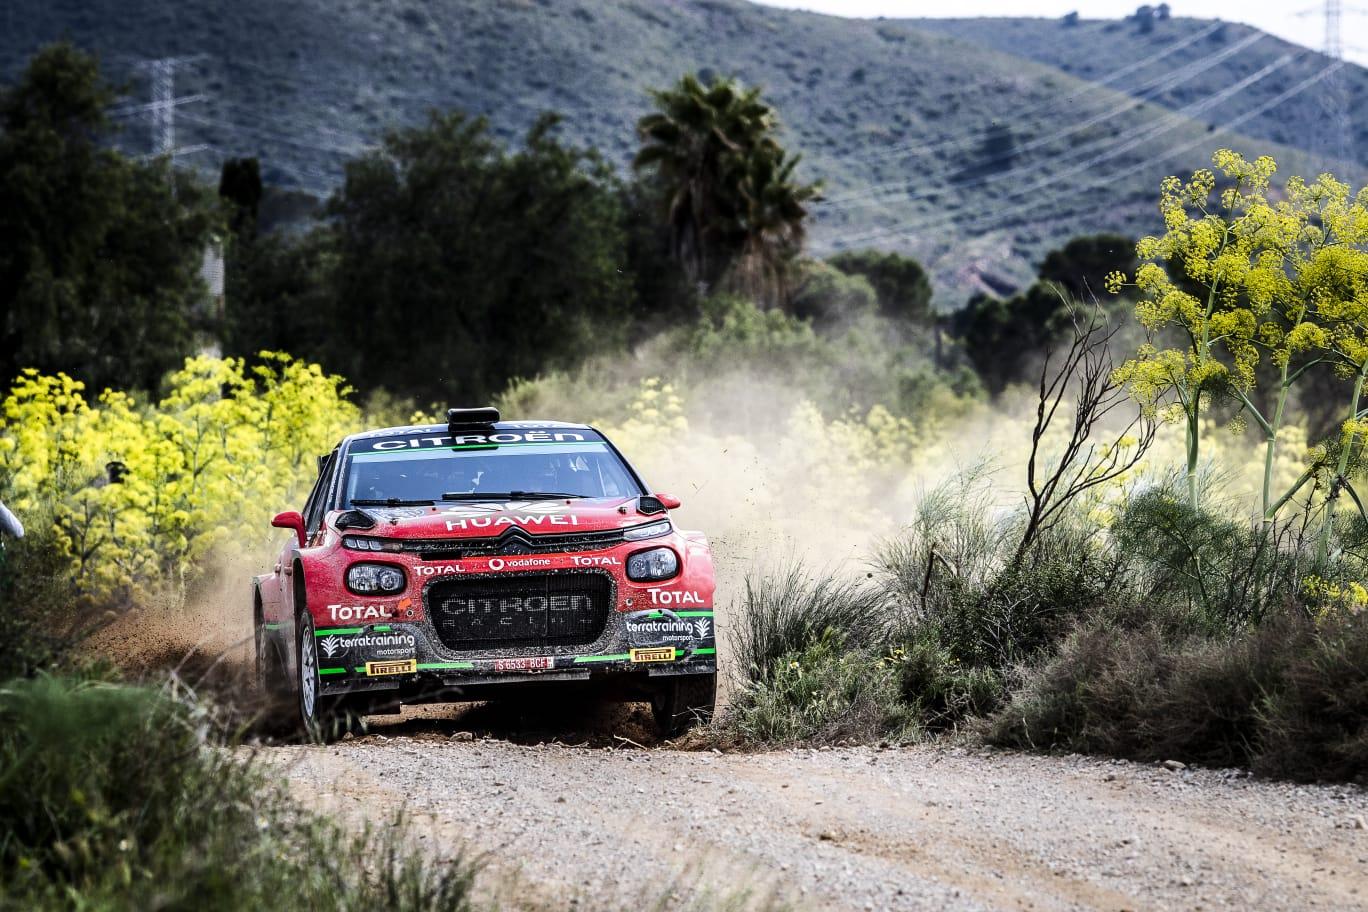 SCER + CERT: 10º Rallye Tierras Altas de Lorca [23-24 Abril] - Página 2 20210424092528